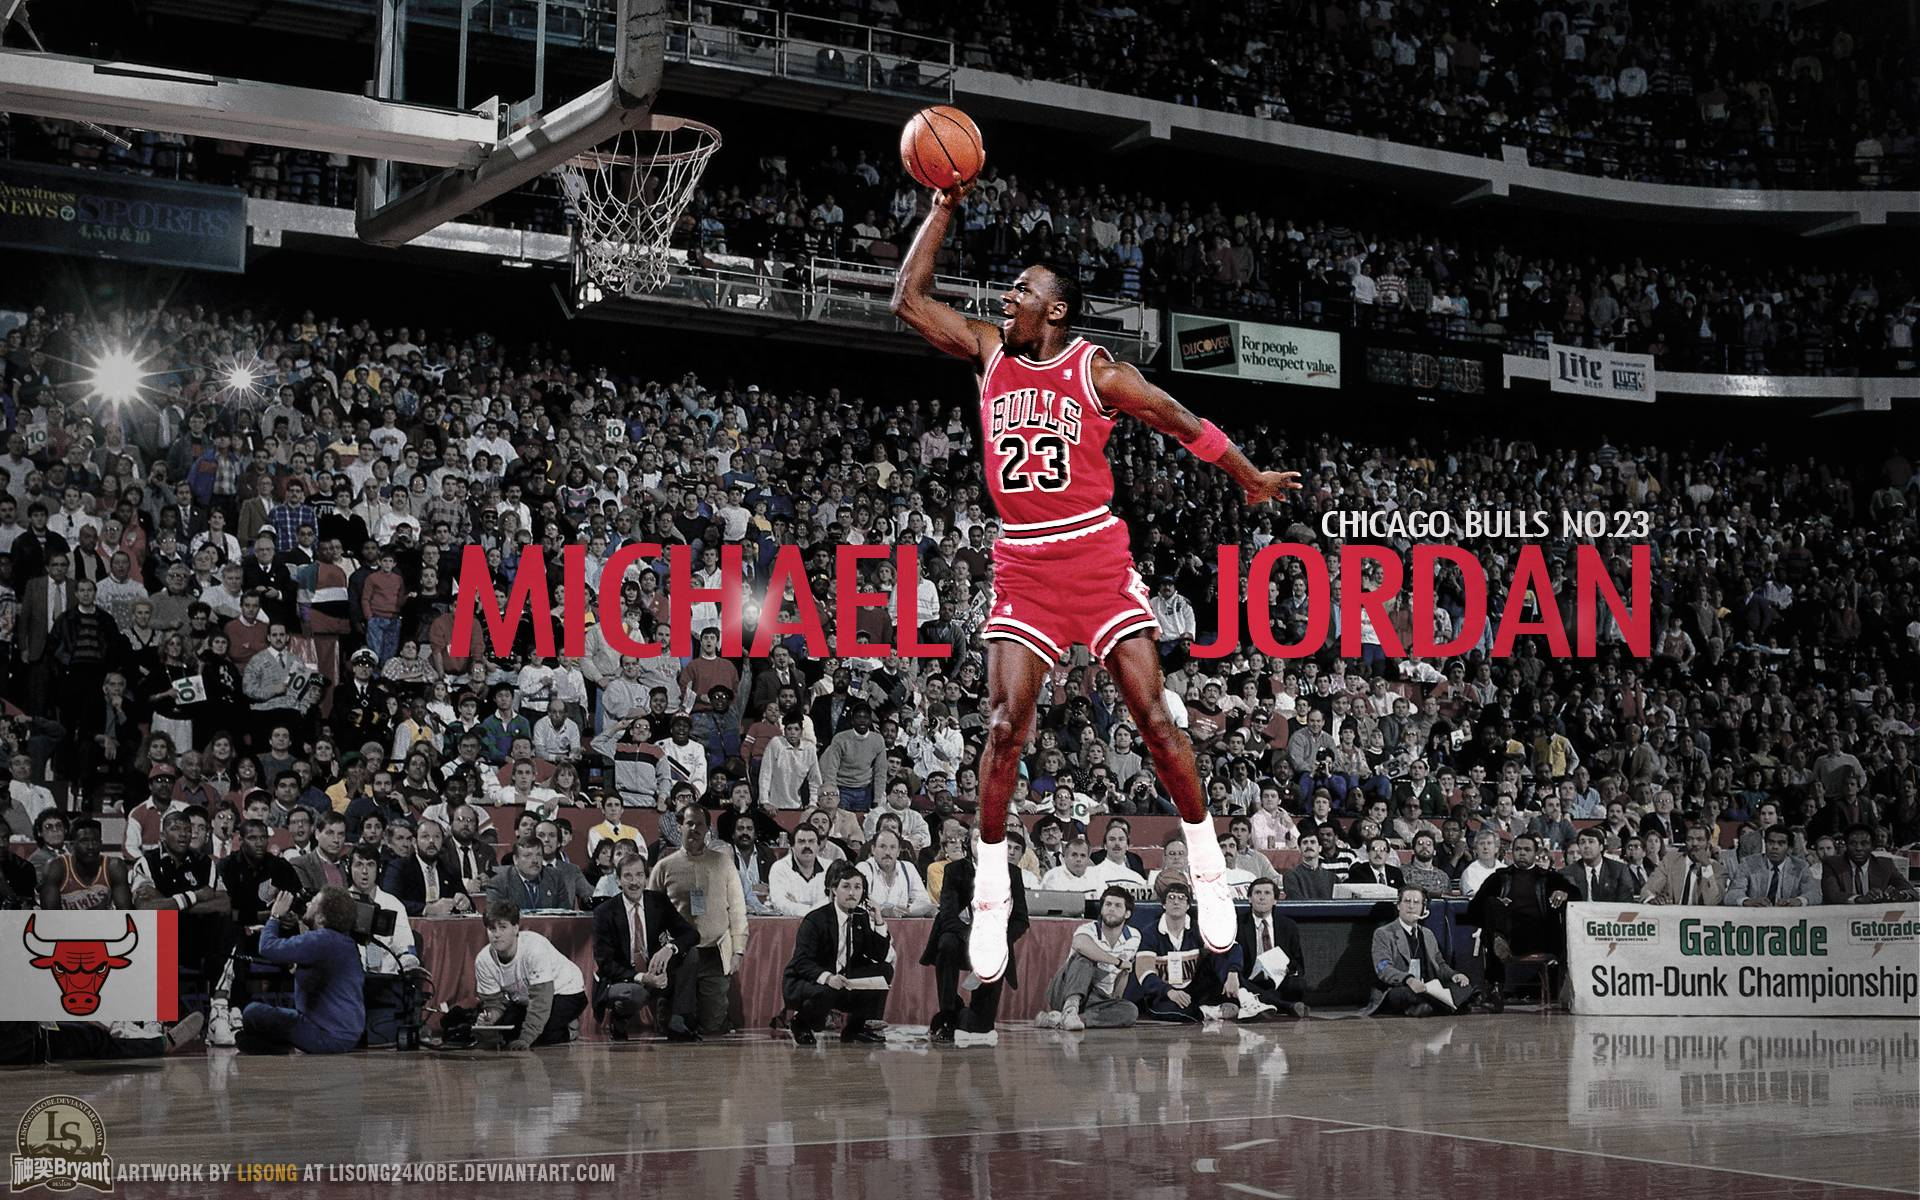 michael jordan wallpaper - photo #21